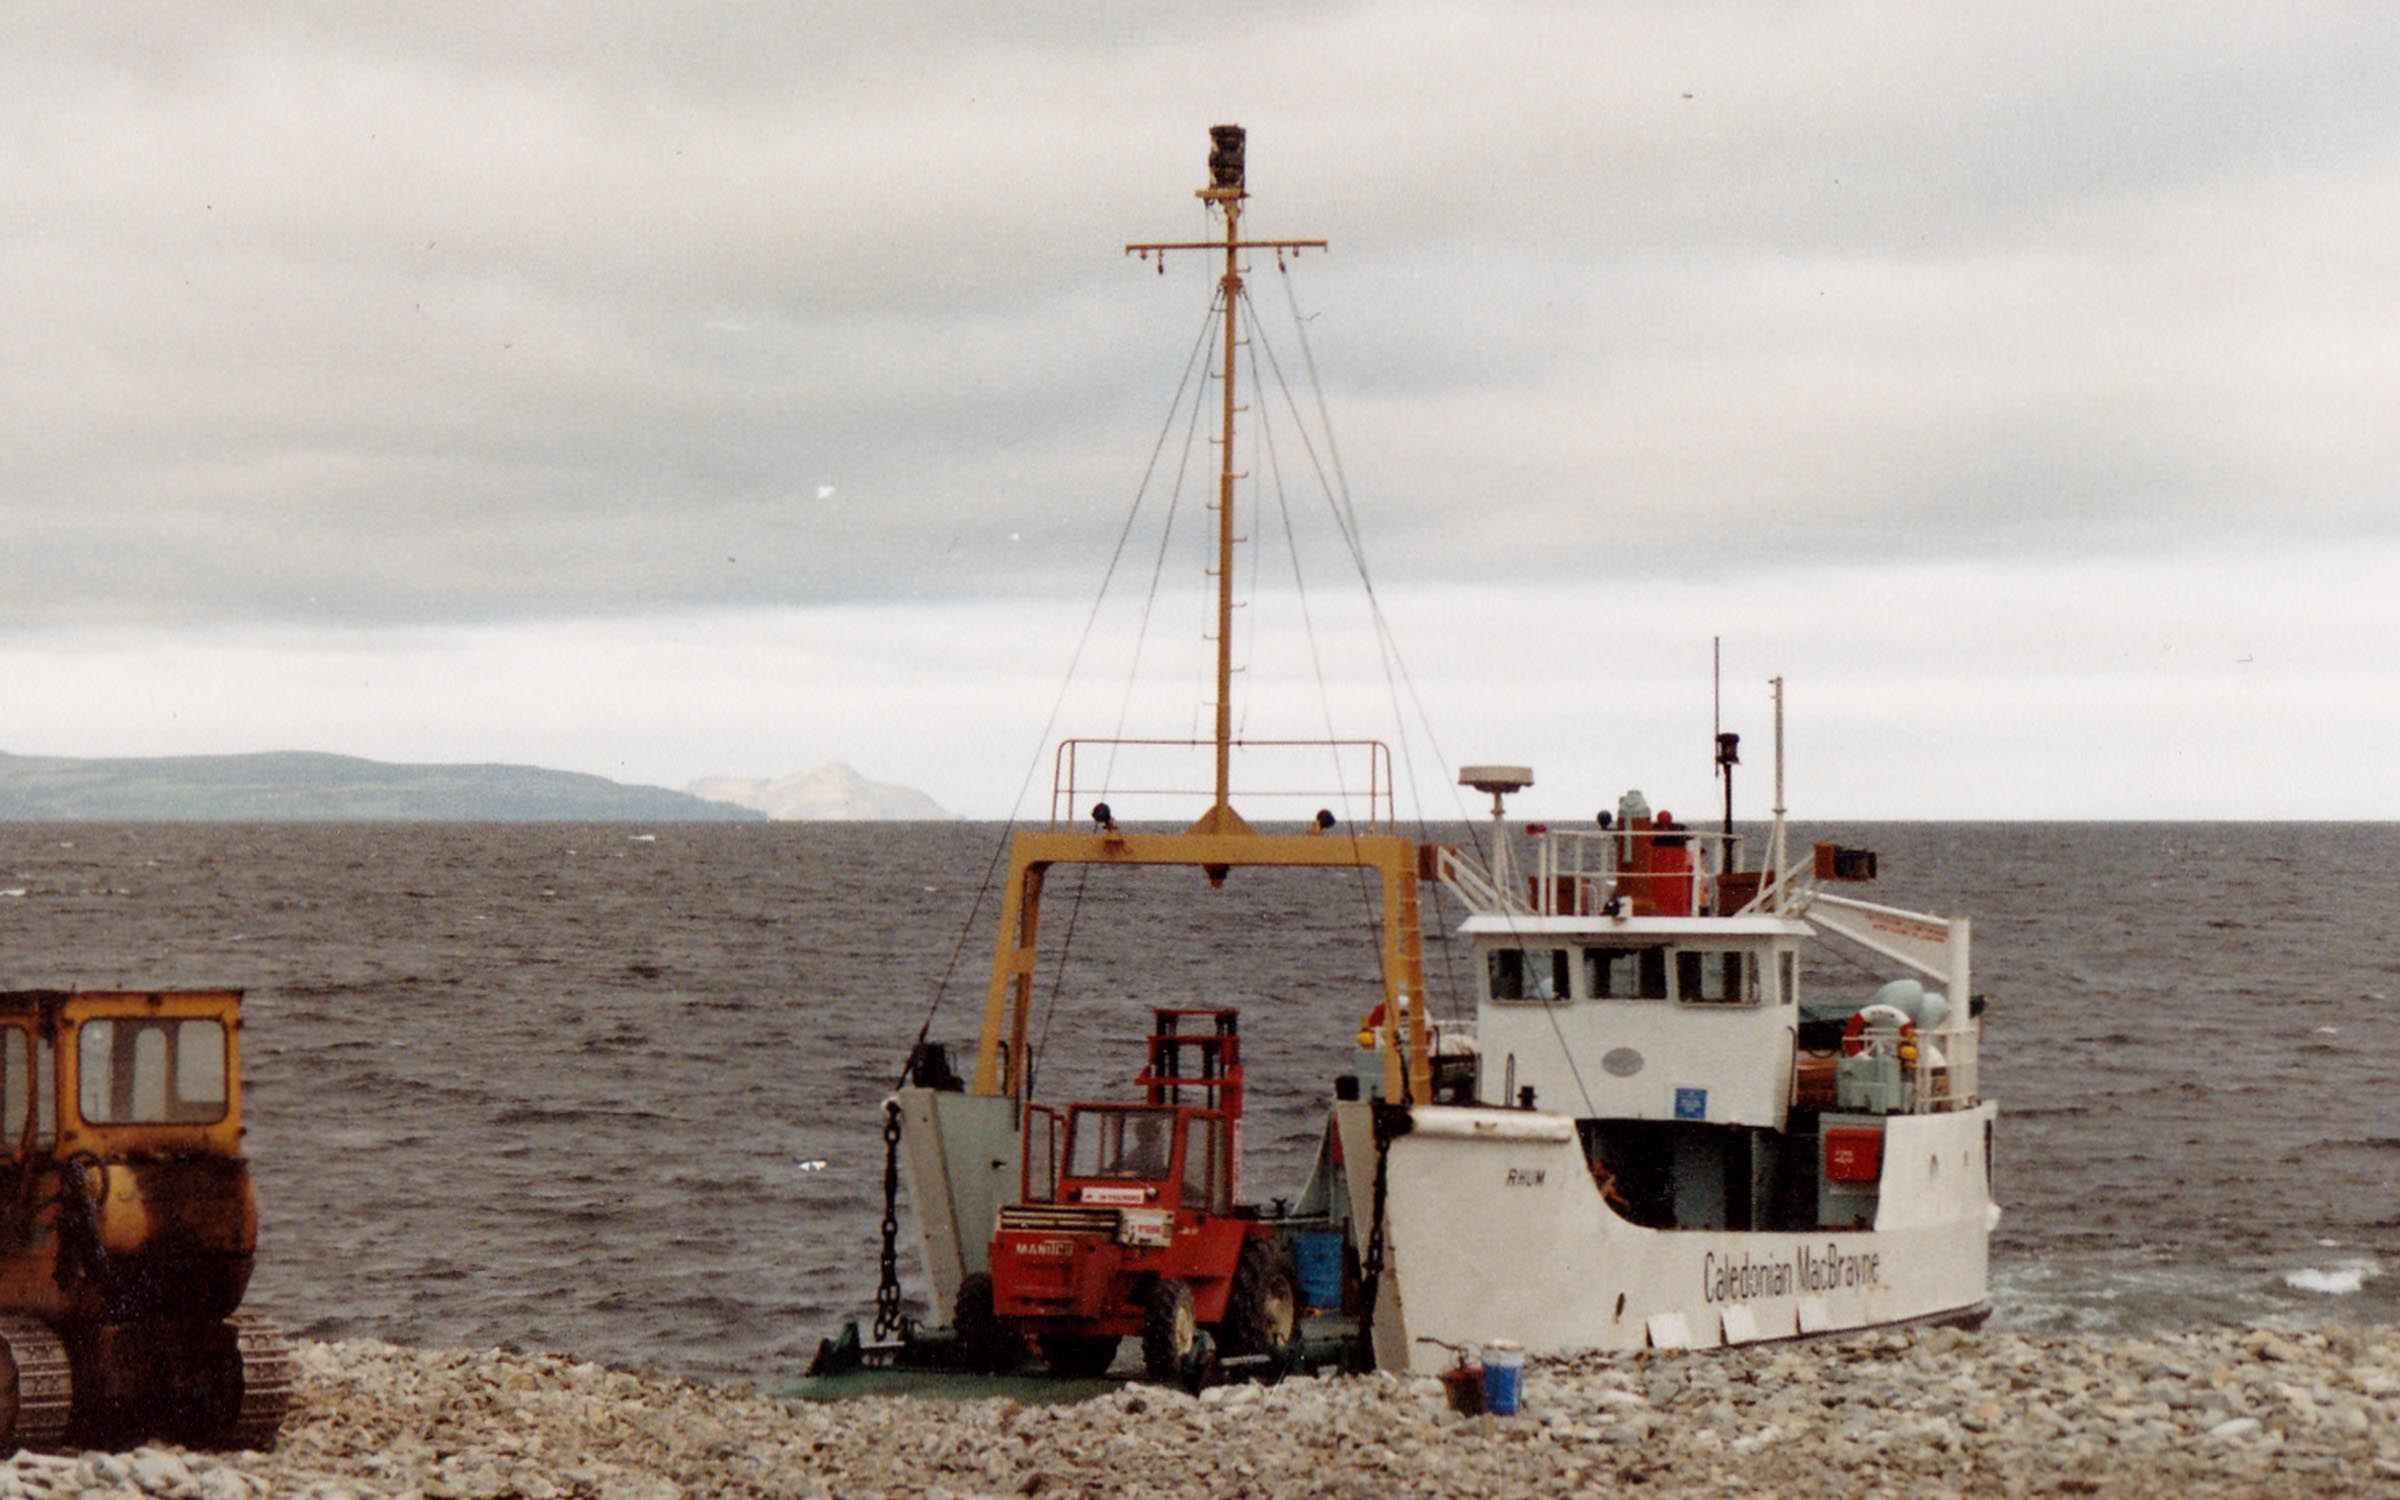 Rhum on charter at Ailsa Craig (Jim Aikman Smith)